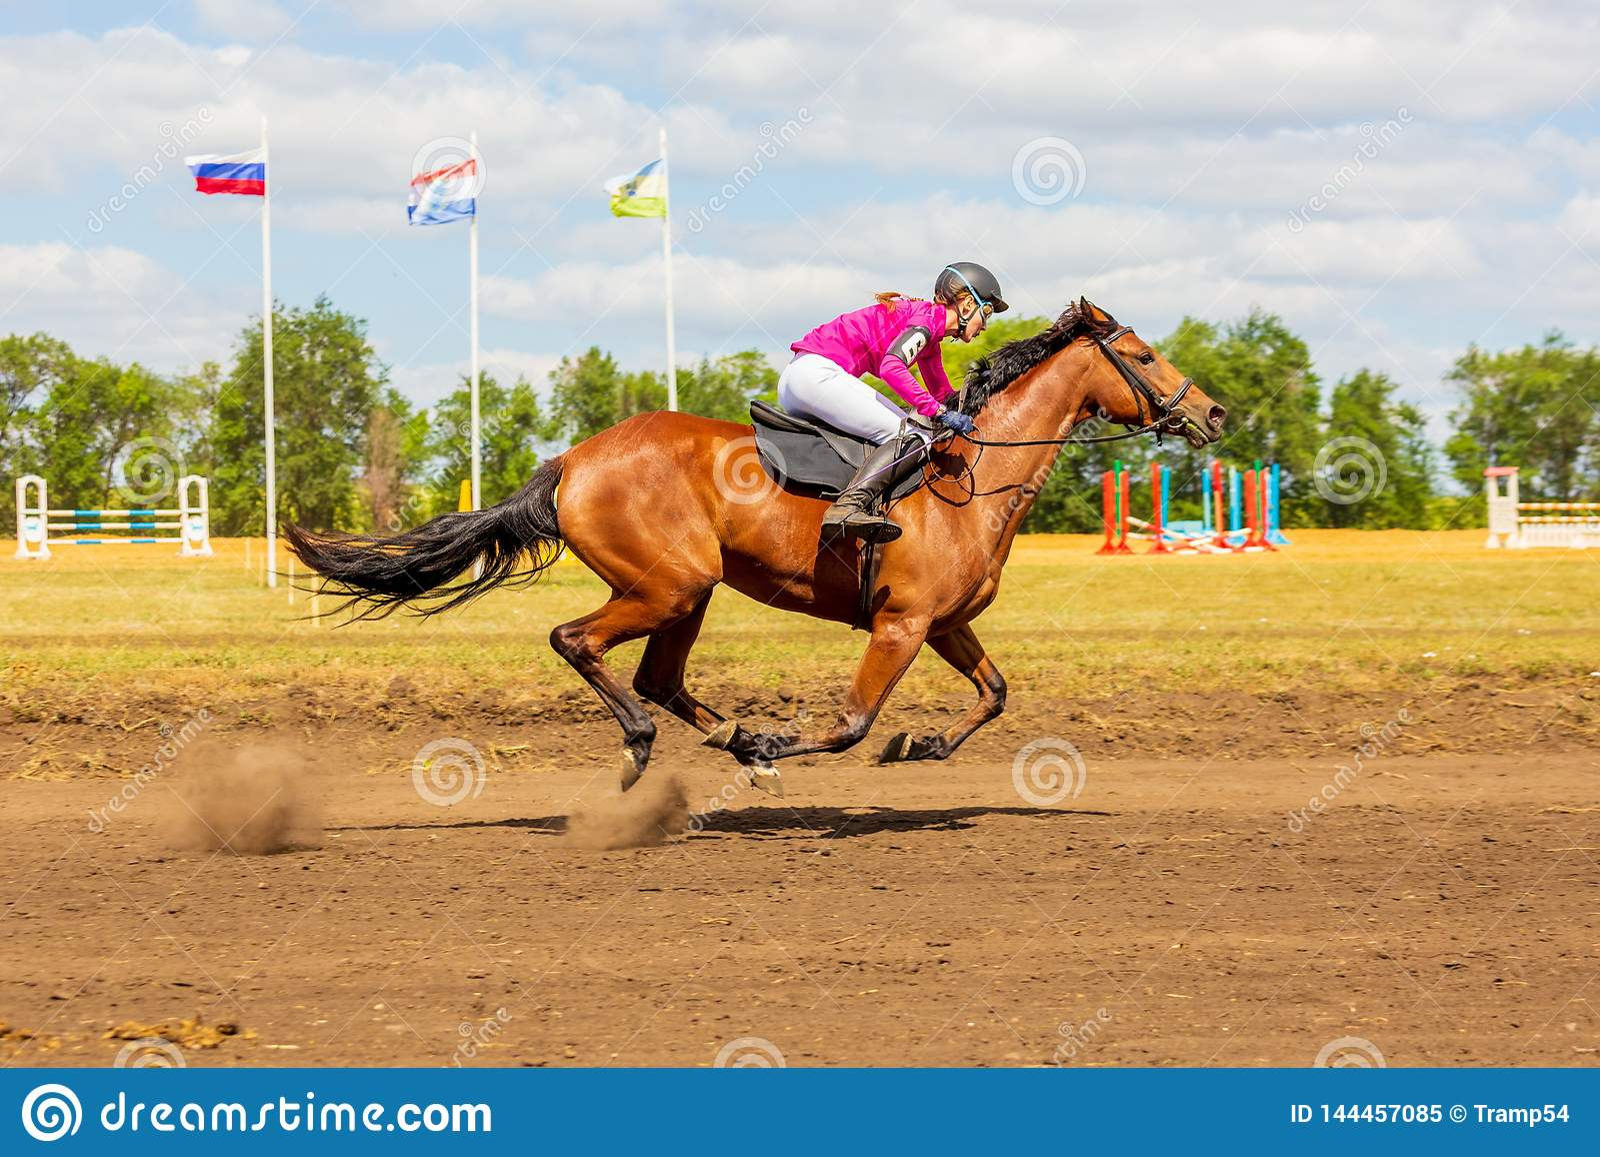 Samara, ao?t 2018 : Une fille participe ? cheval ? la course de chevaux